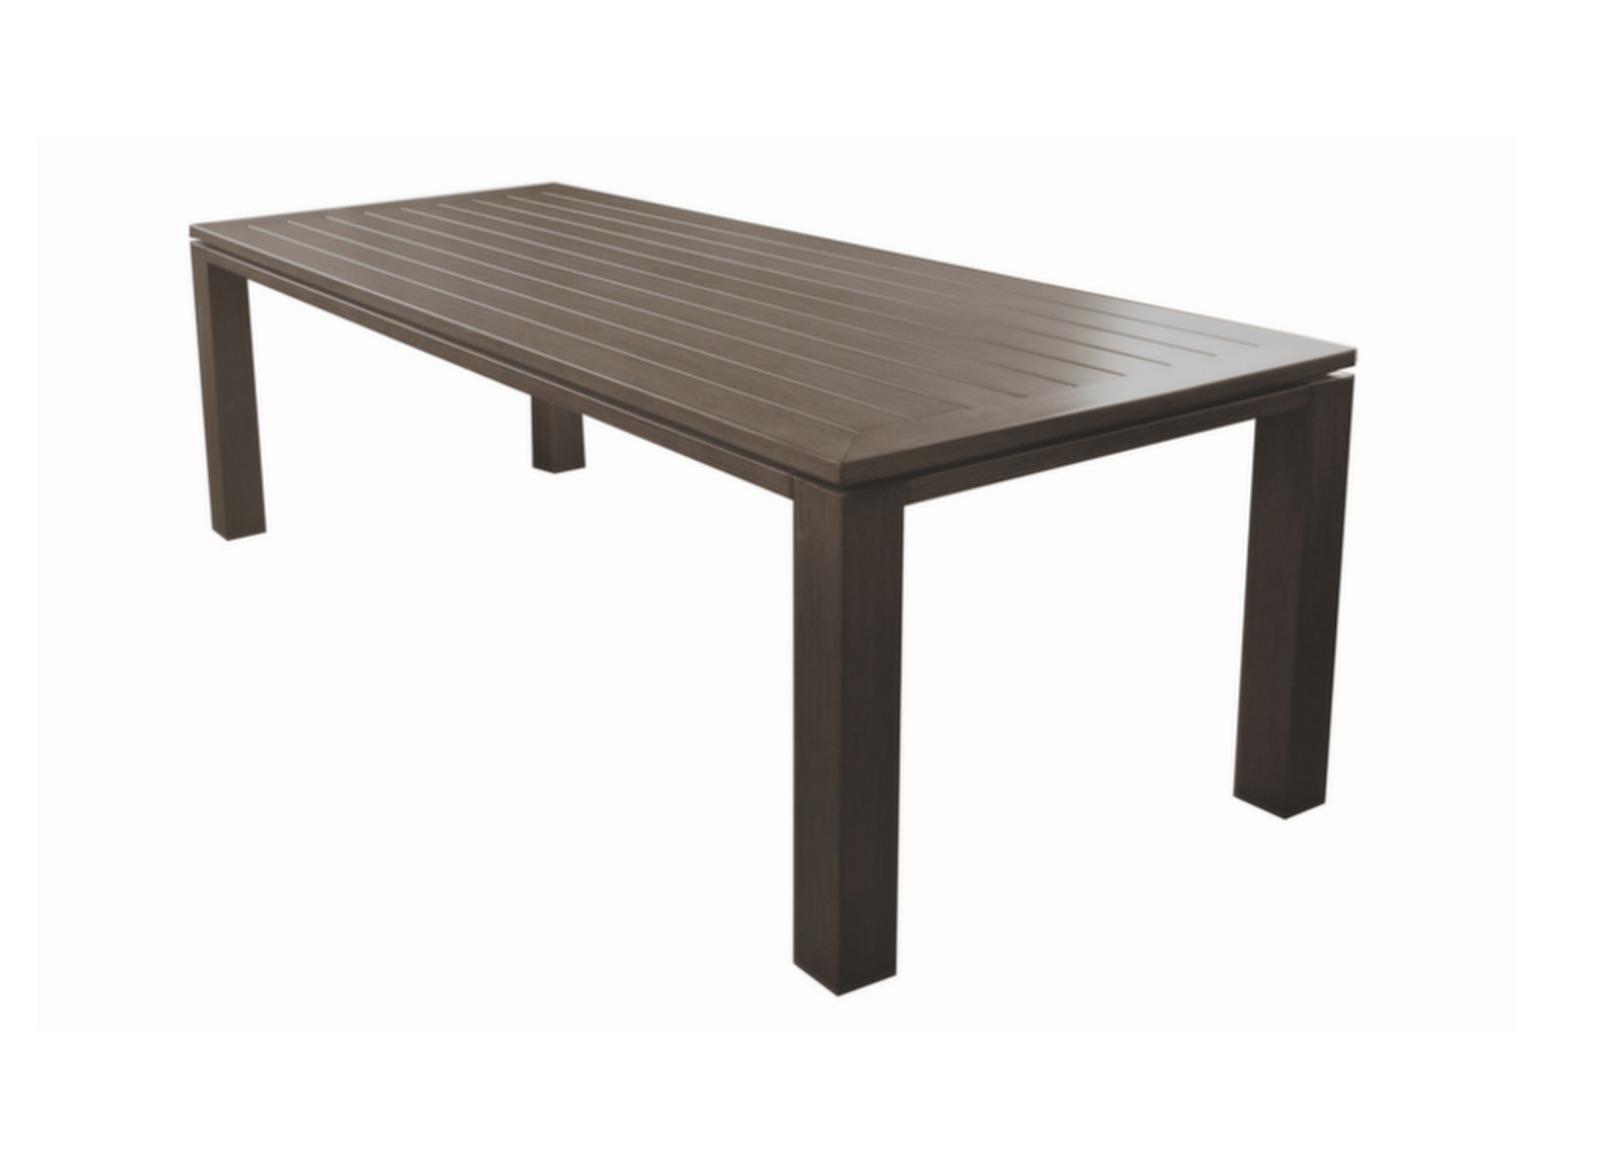 table latino 240 ice tables de jardin meubles de jardin en ligne proloisirs mobilier de. Black Bedroom Furniture Sets. Home Design Ideas